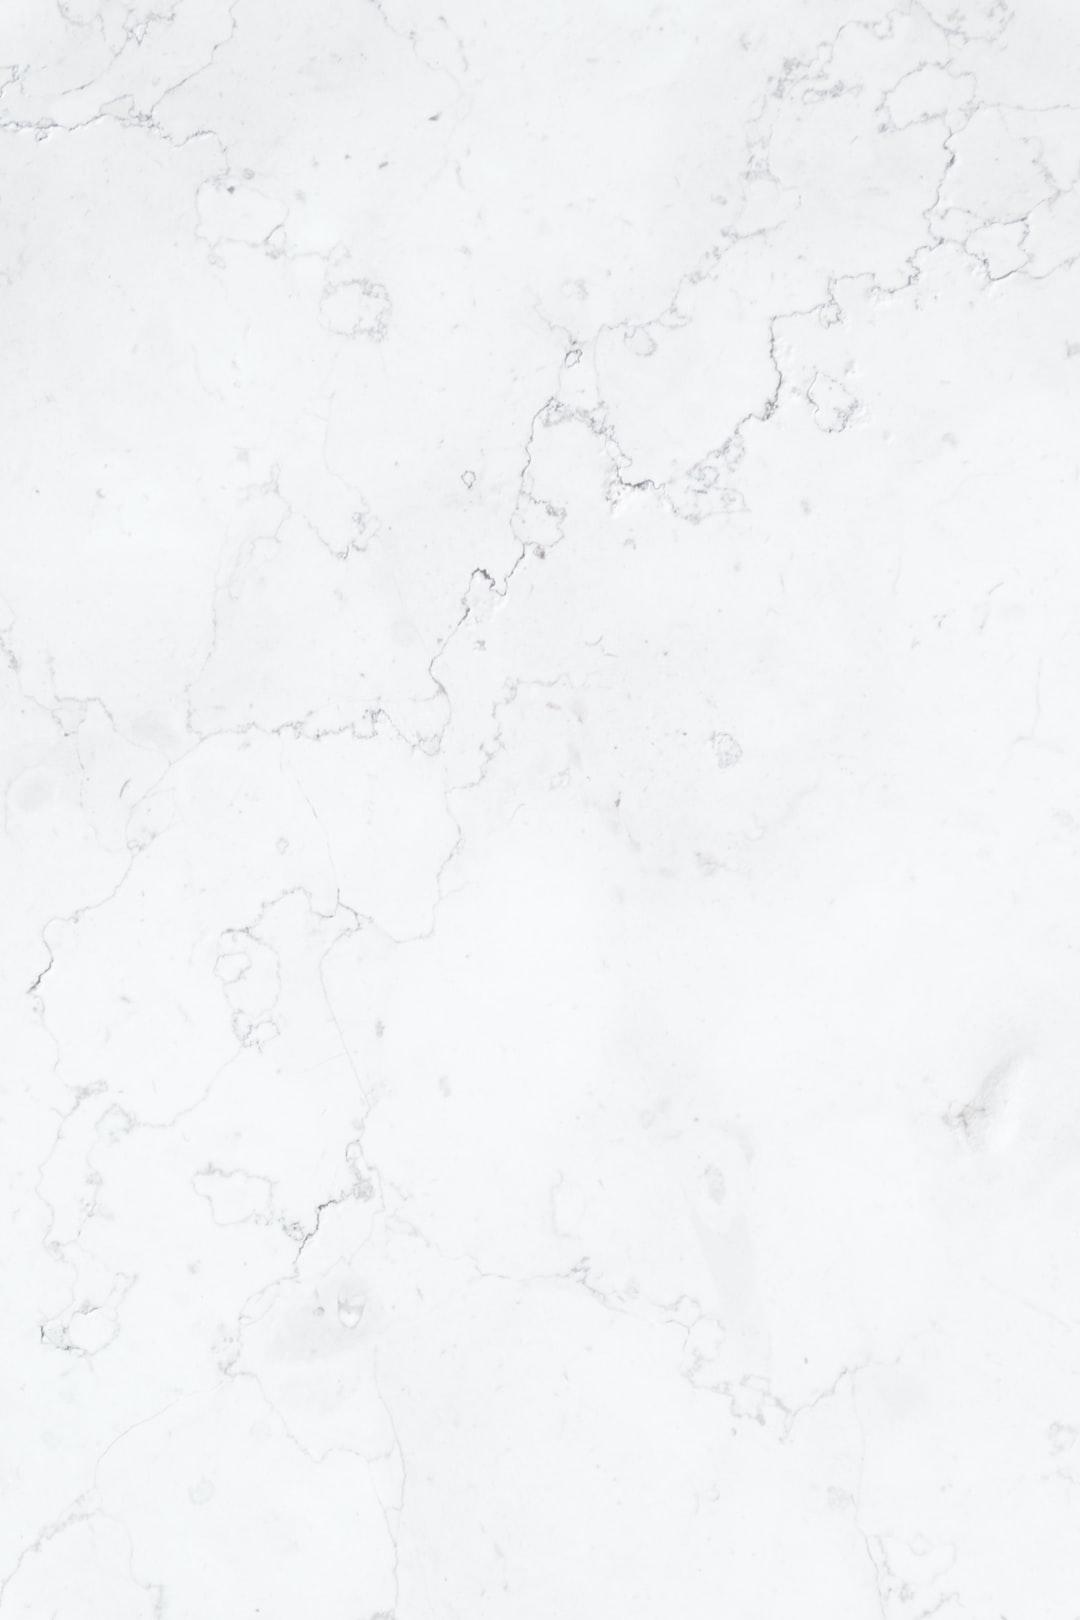 Marble Wallpapers HD Download [500 HQ] Unsplash 1080x1620